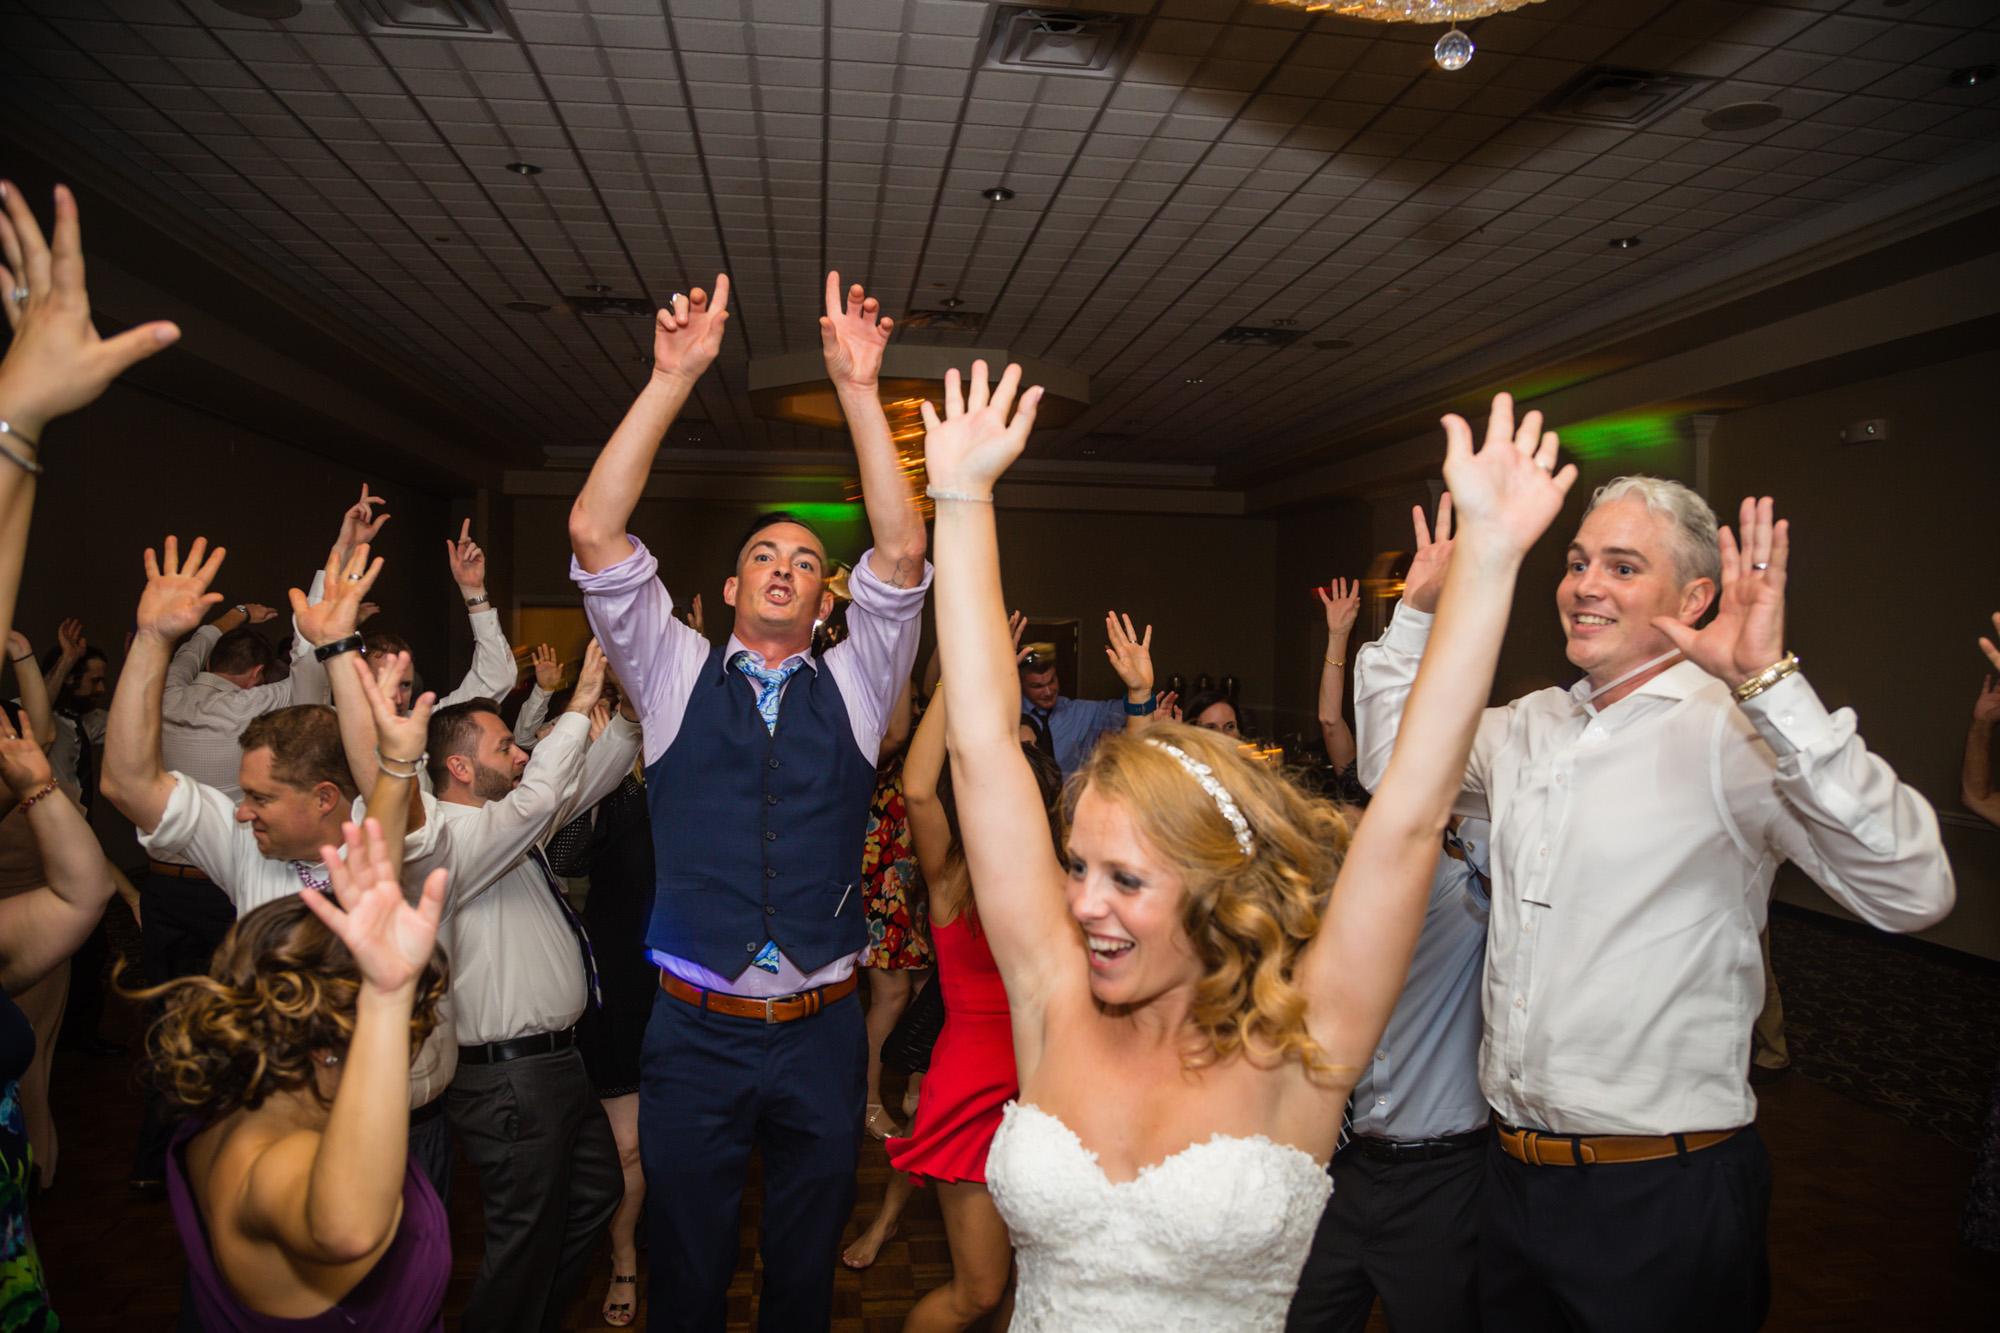 scranton_wedding_photographer_lettieri_pa (41 of 47).jpg